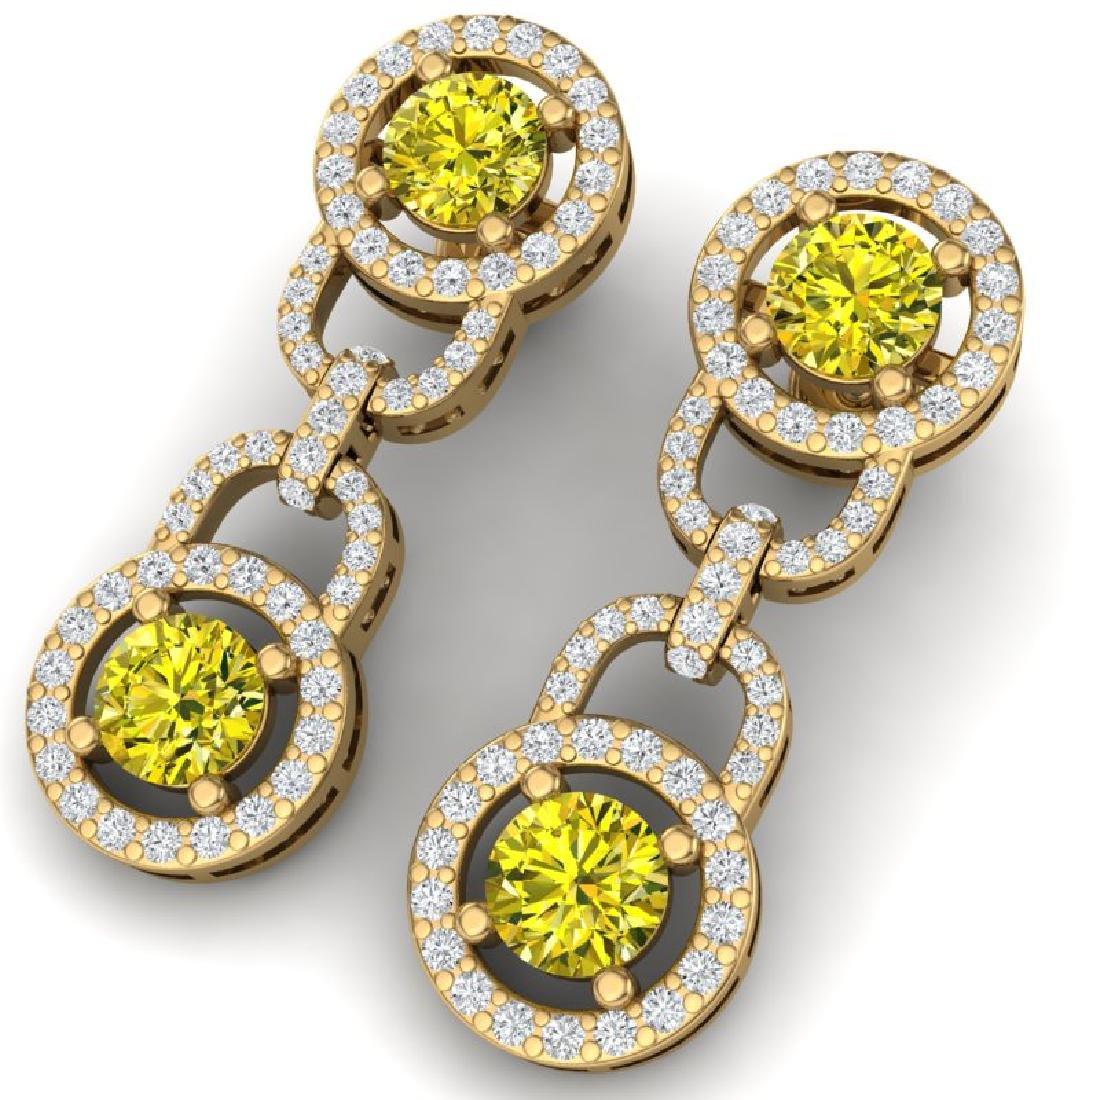 4 CTW SI/I Fancy Yellow And White Diamond Earrings 18K